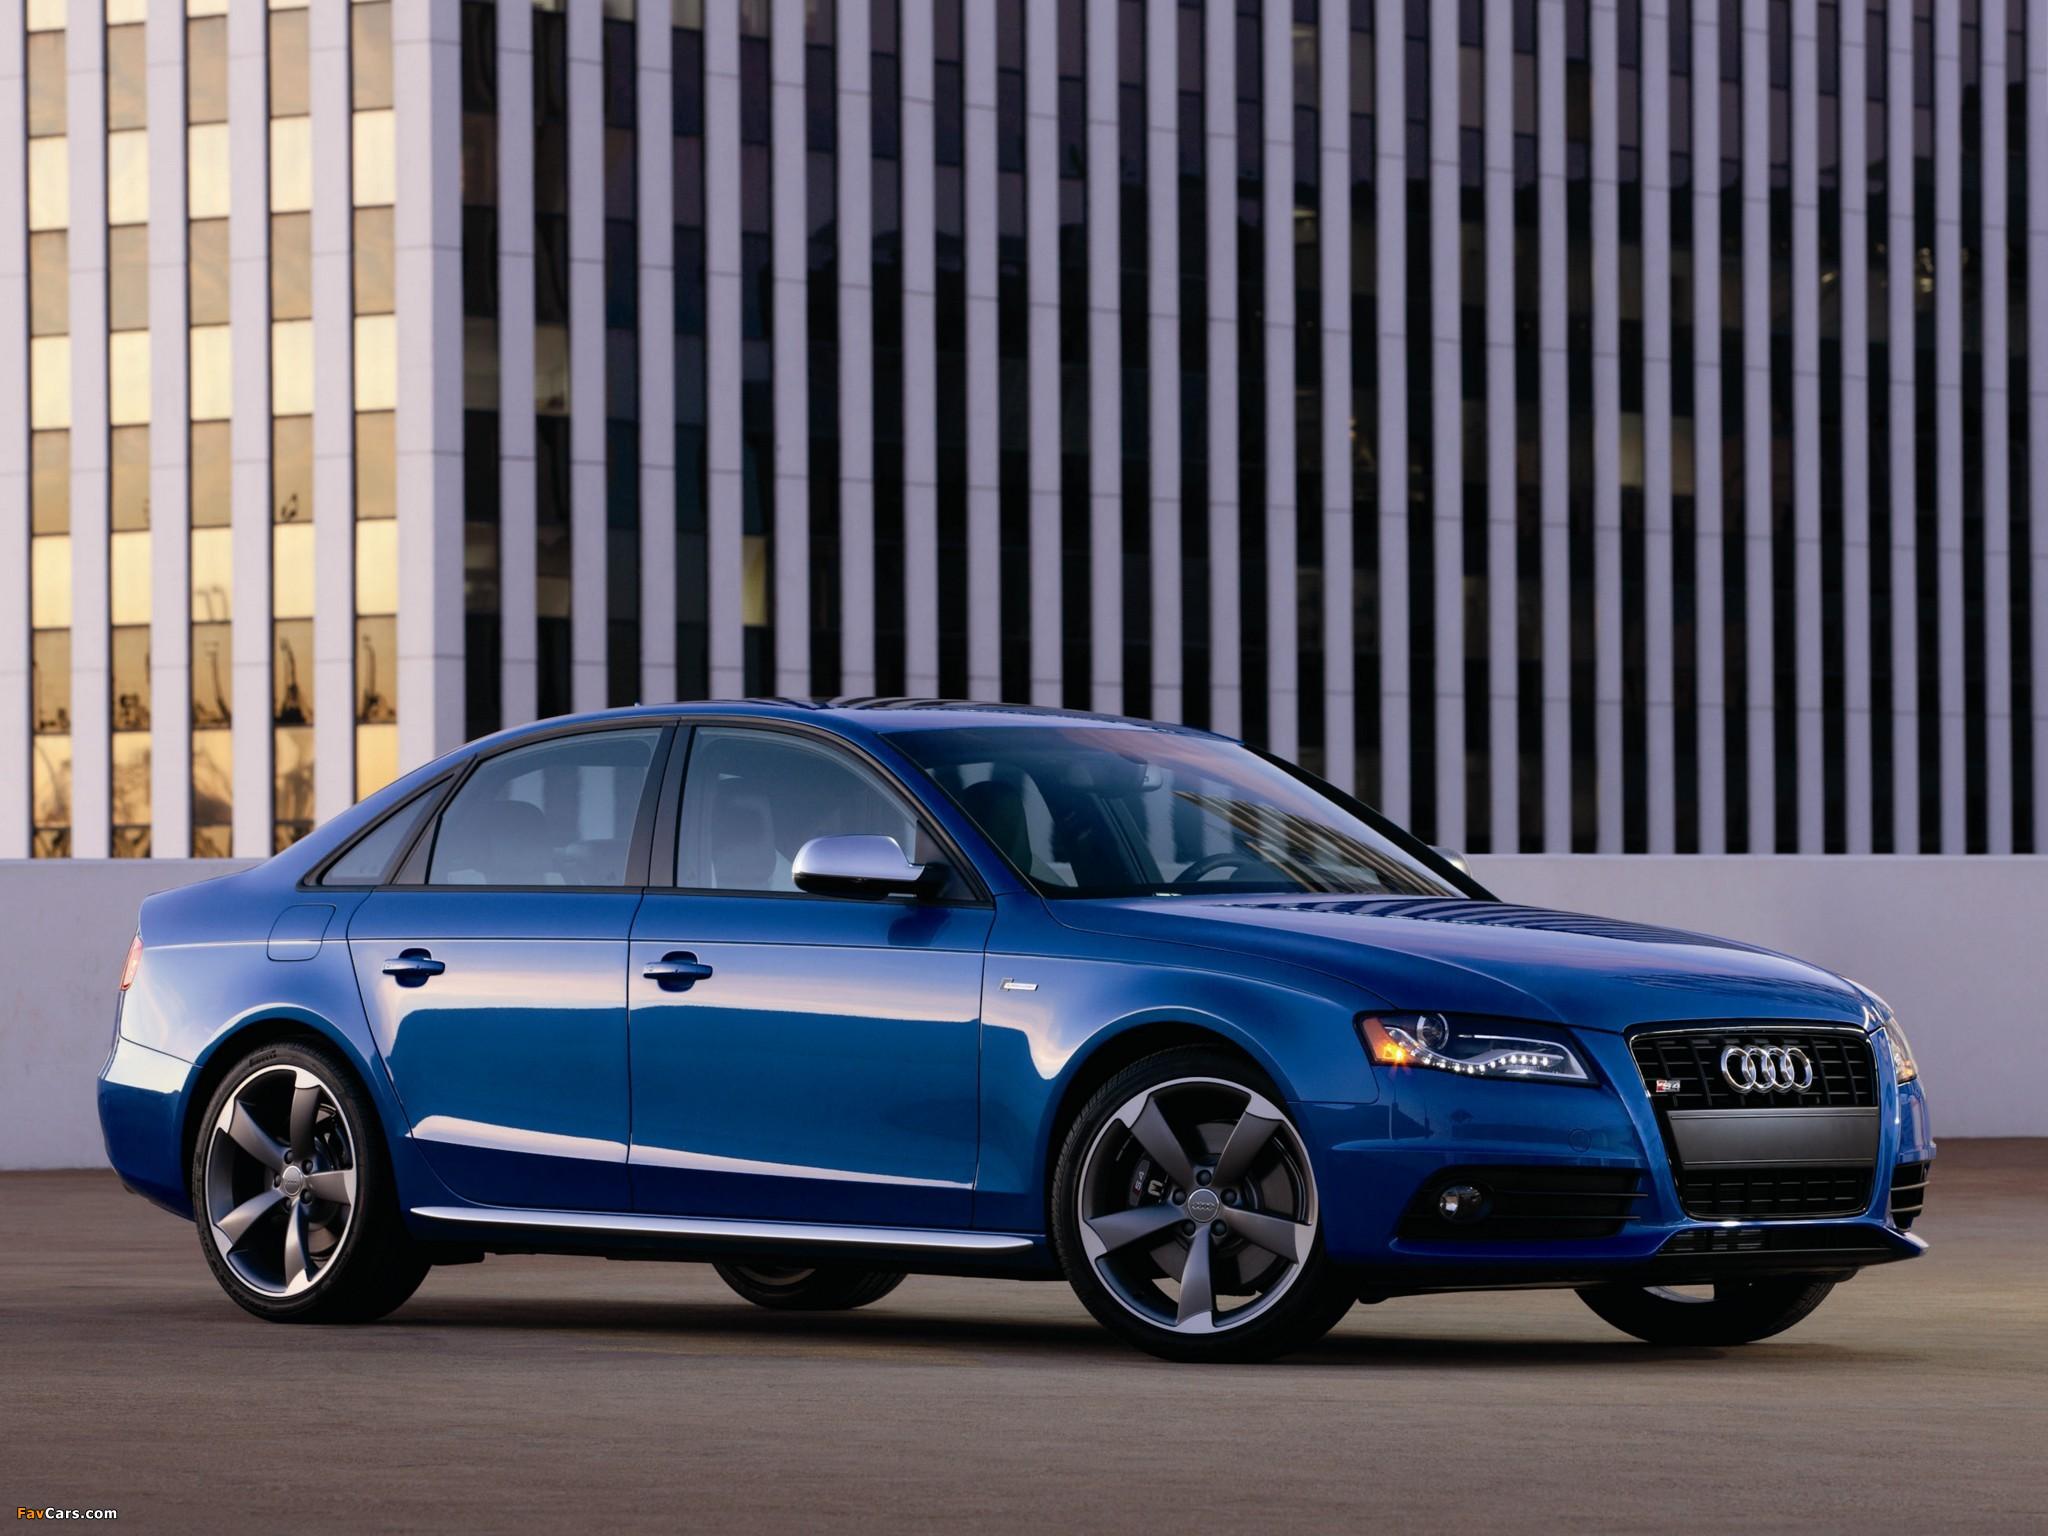 Kekurangan Audi S4 2009 Tangguh